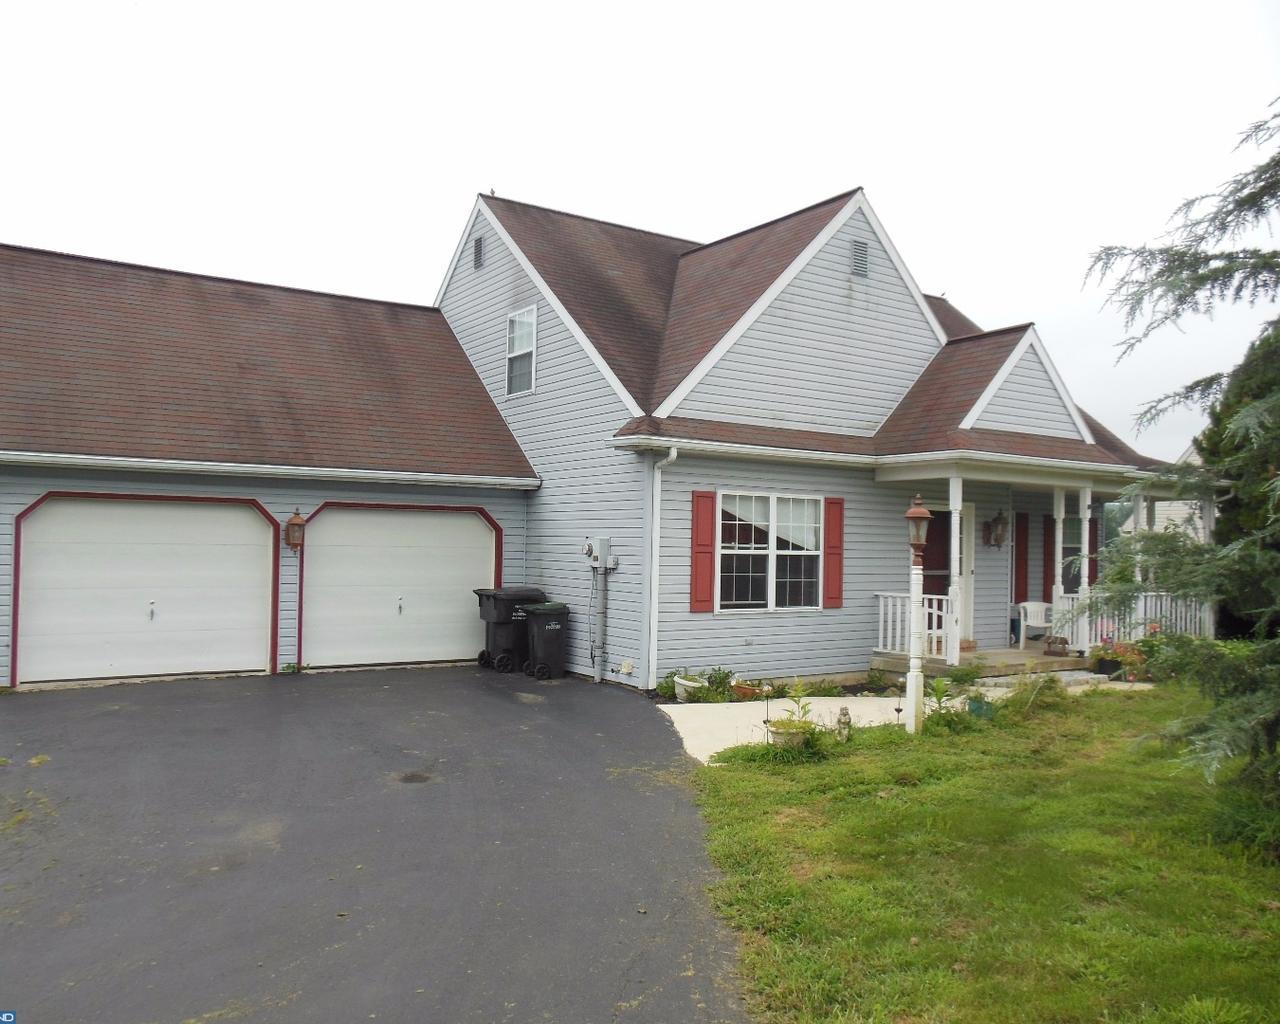 Property for sale at 444 GLEN RUN DR, Atglen,  PA 19310